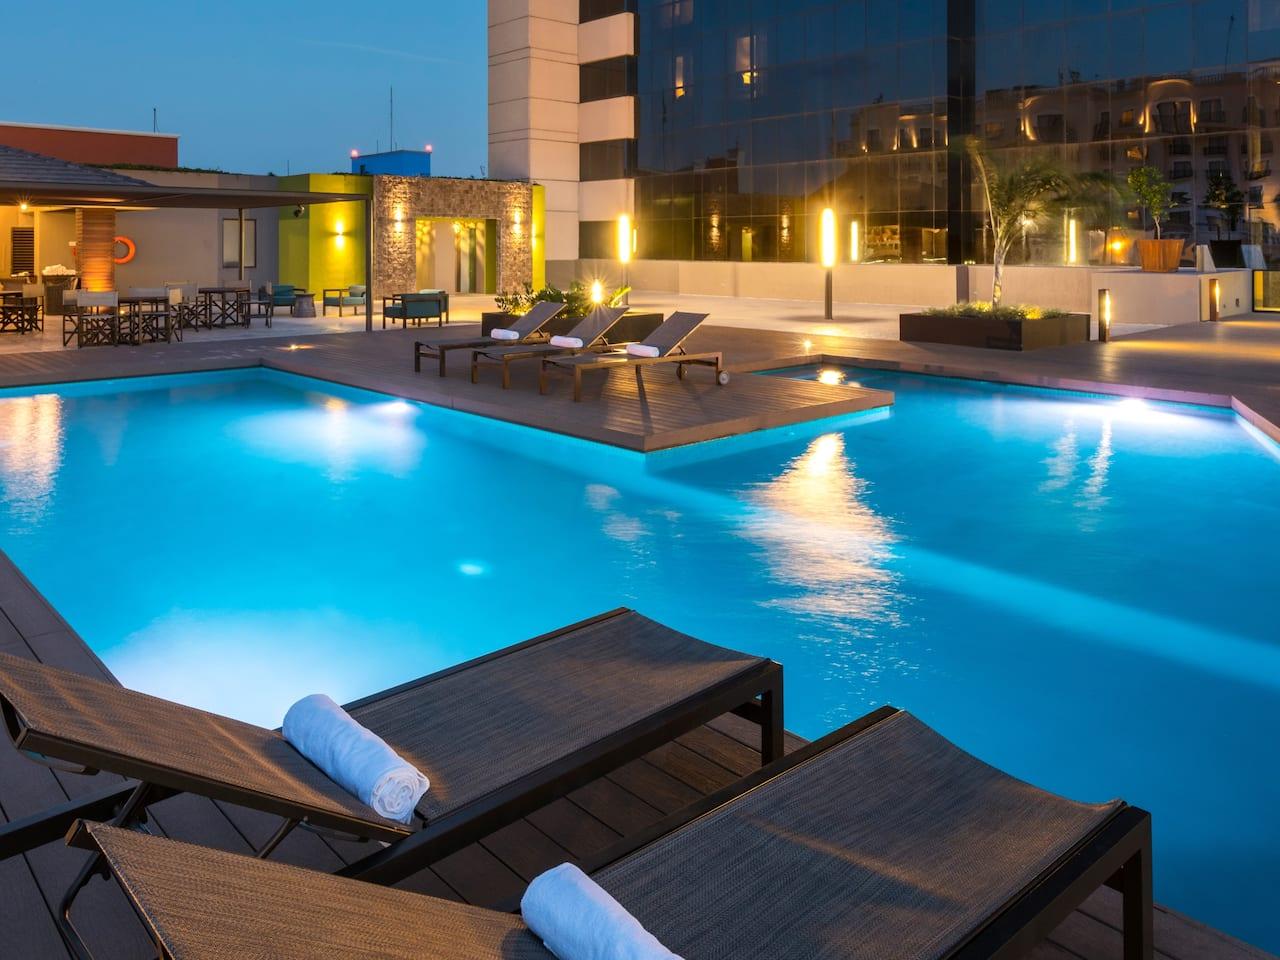 pool in merida mexico